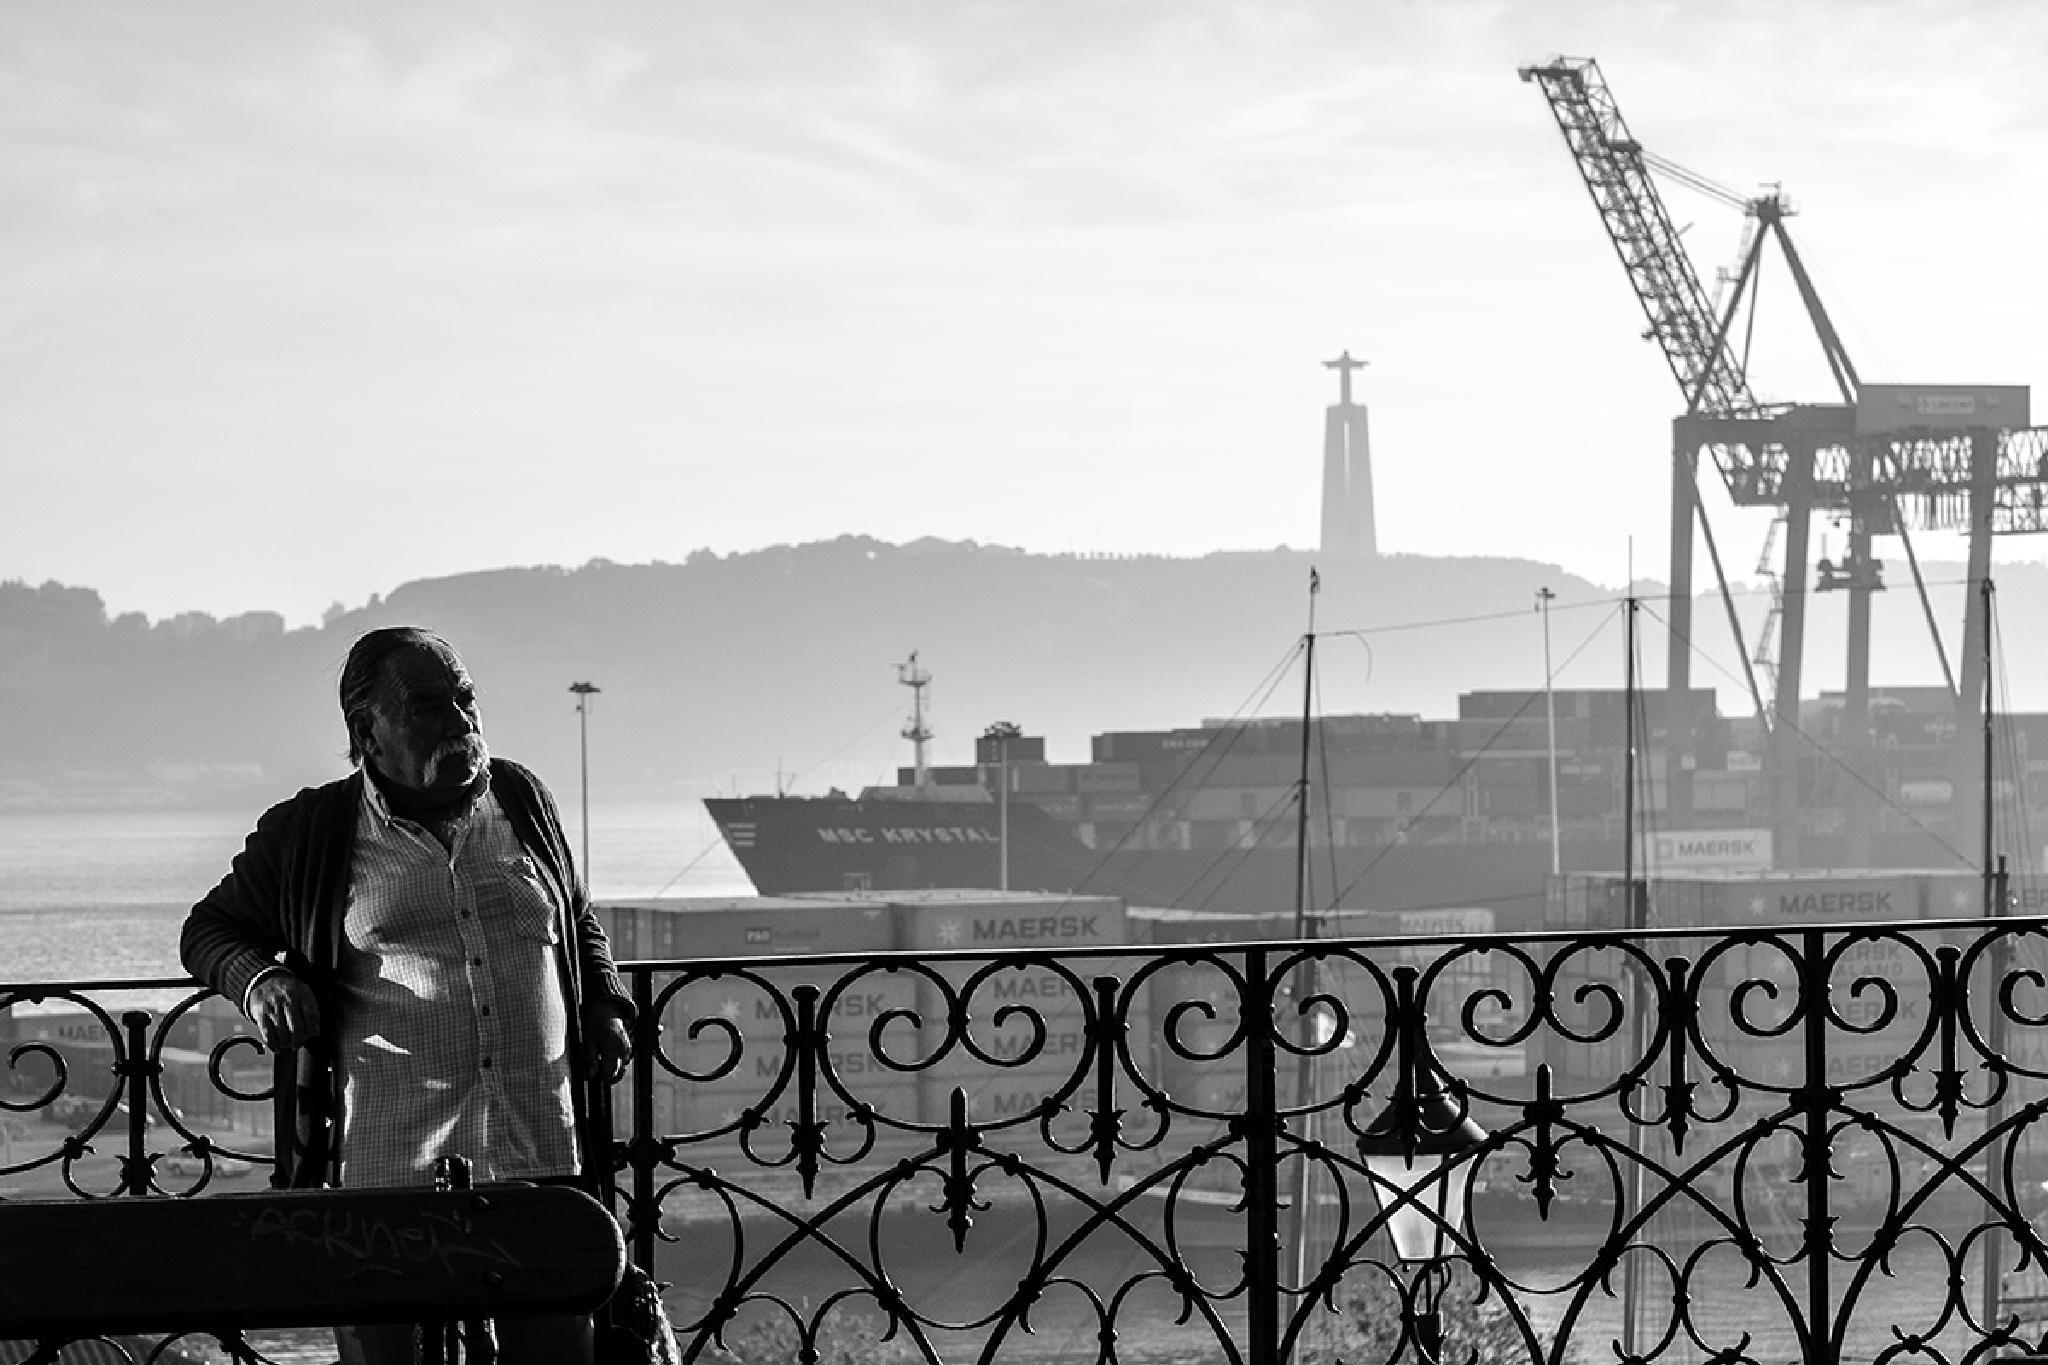 Industrial port by Arnaud BROSSARD